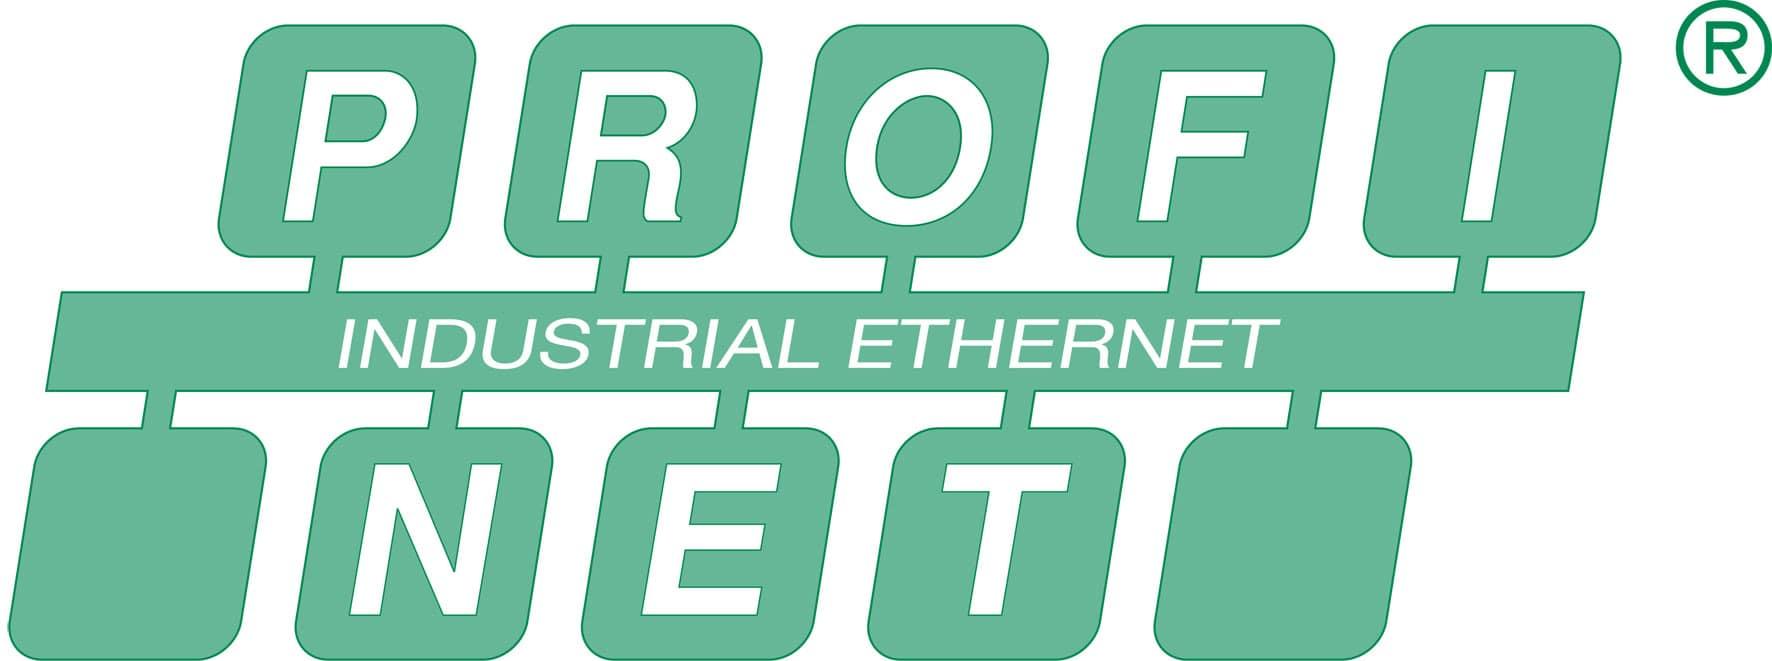 Profinet_logo